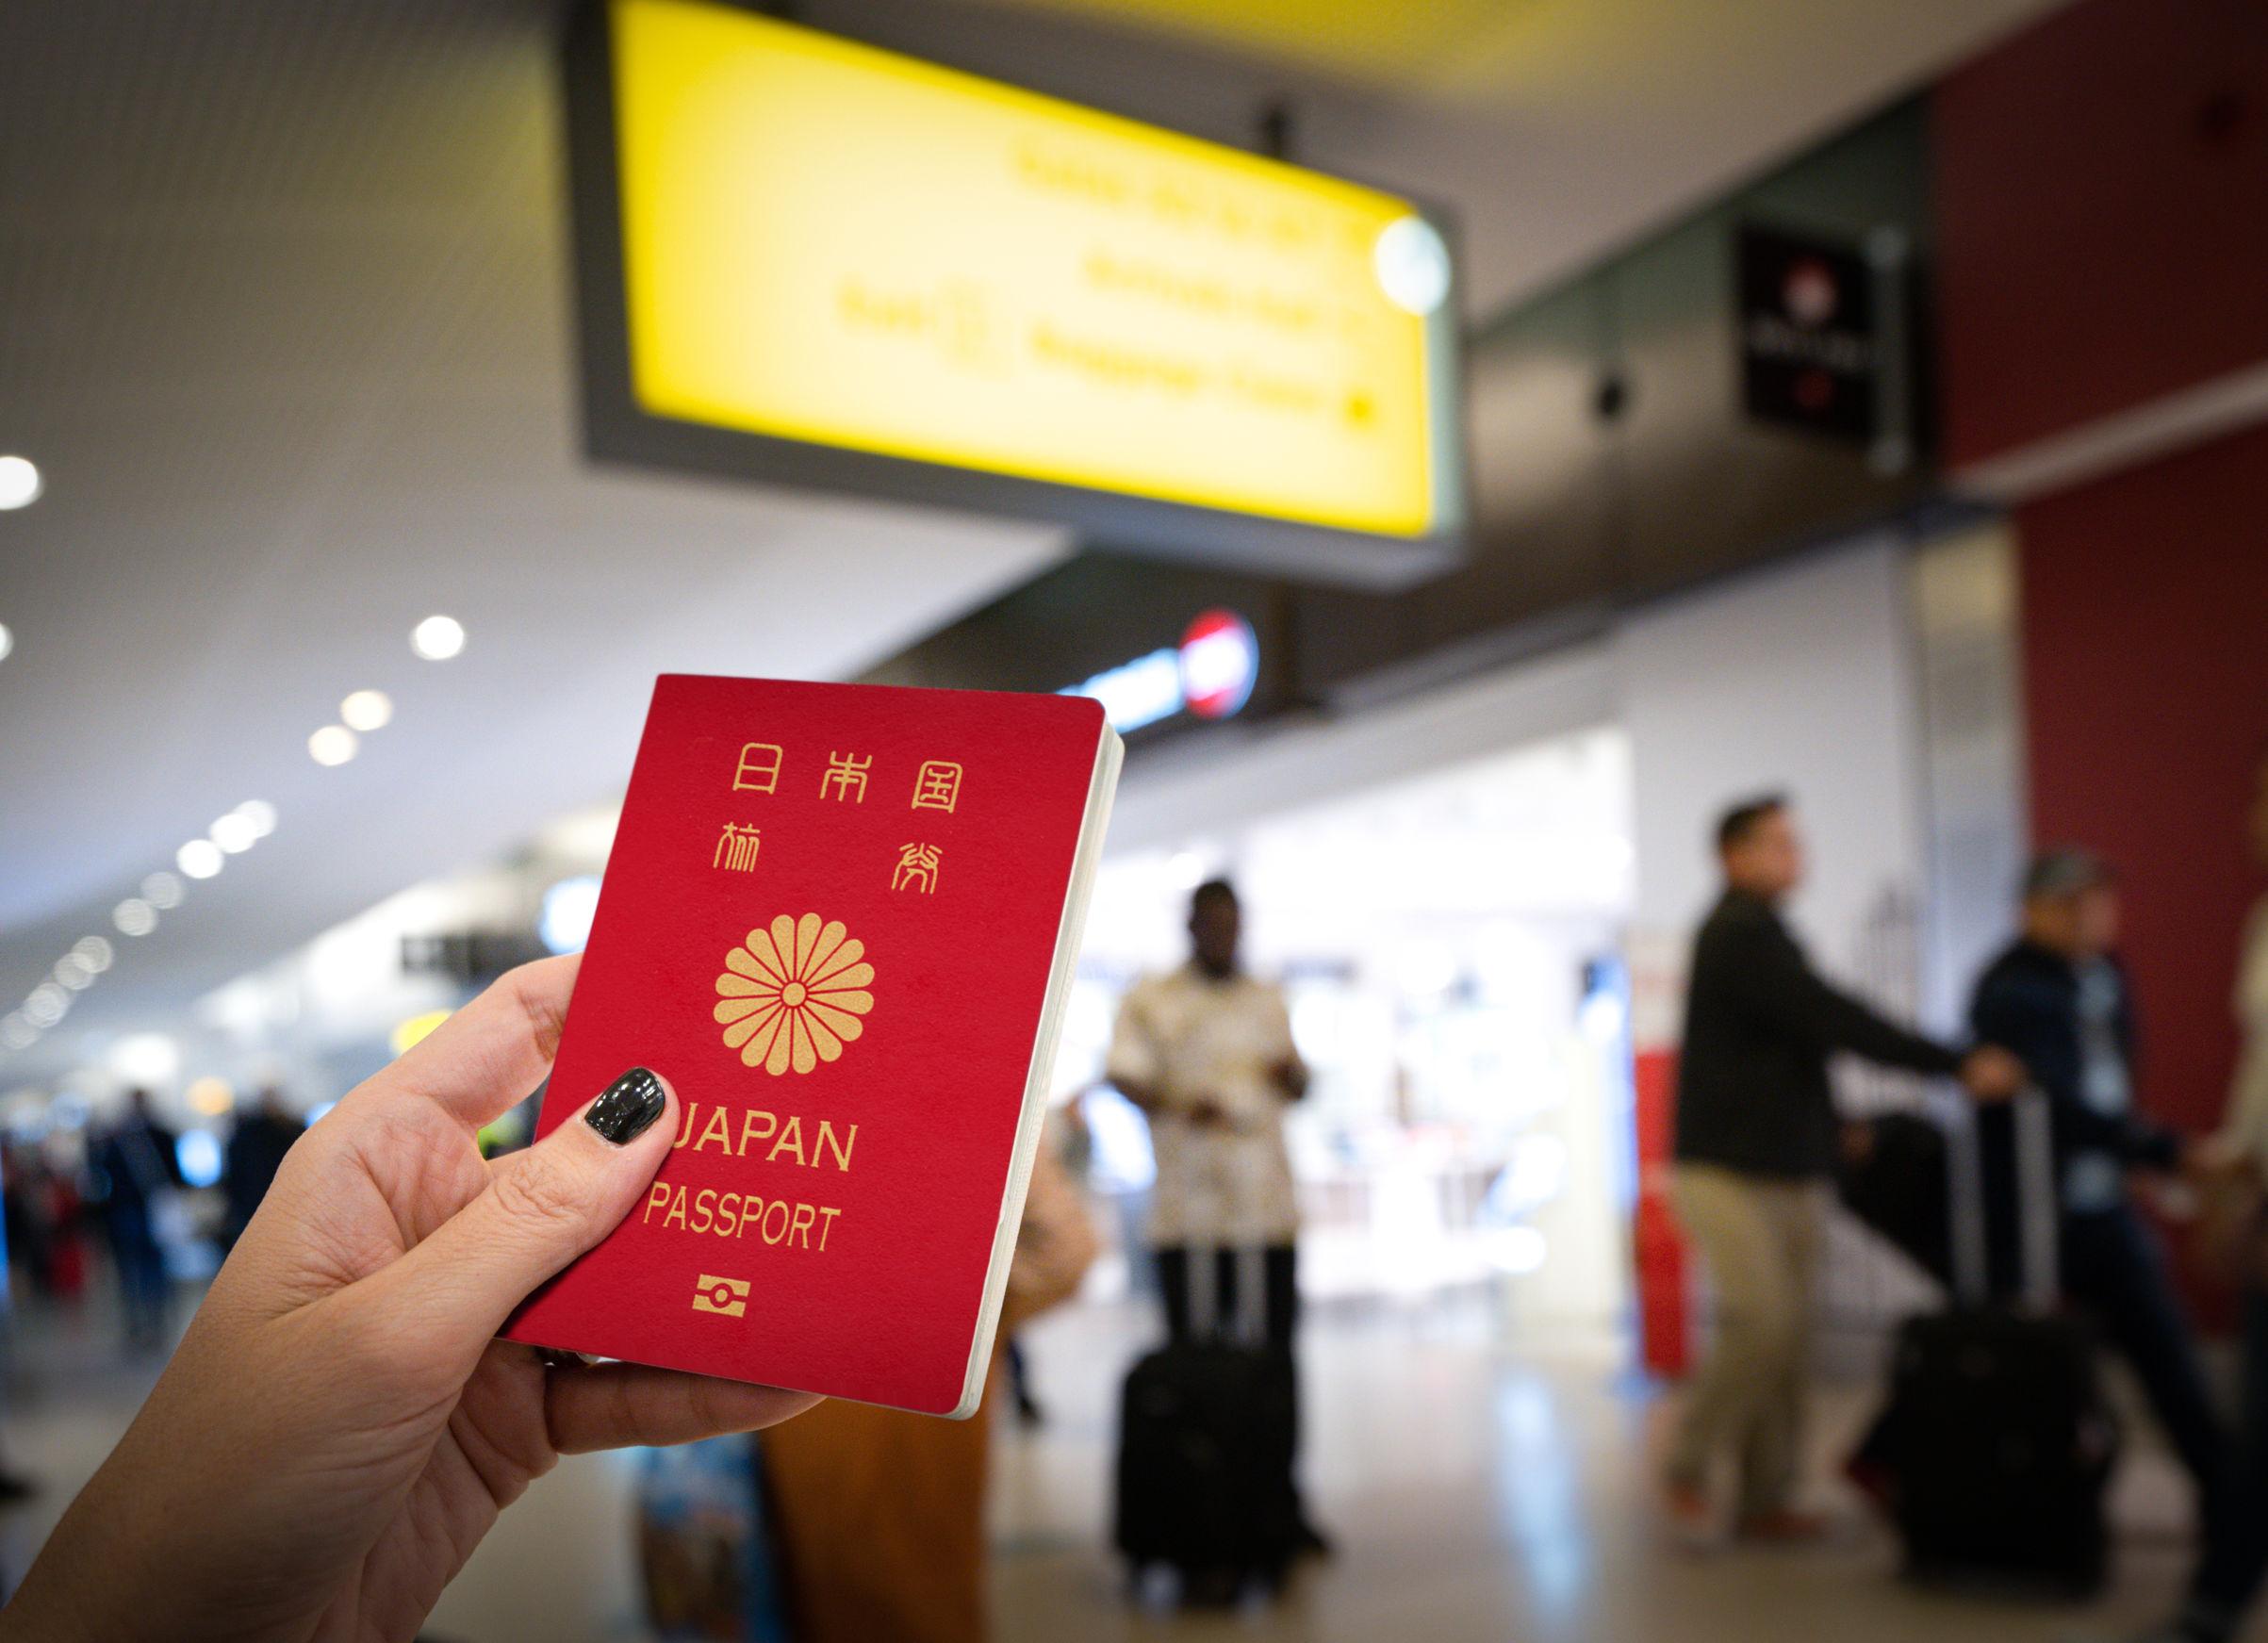 Japan Vietnam Procedure Condition To Get Vietnam Visa For Visitors From Japan During Covid 19 Vietnam Immigration Service Evisa Visa On Arrival